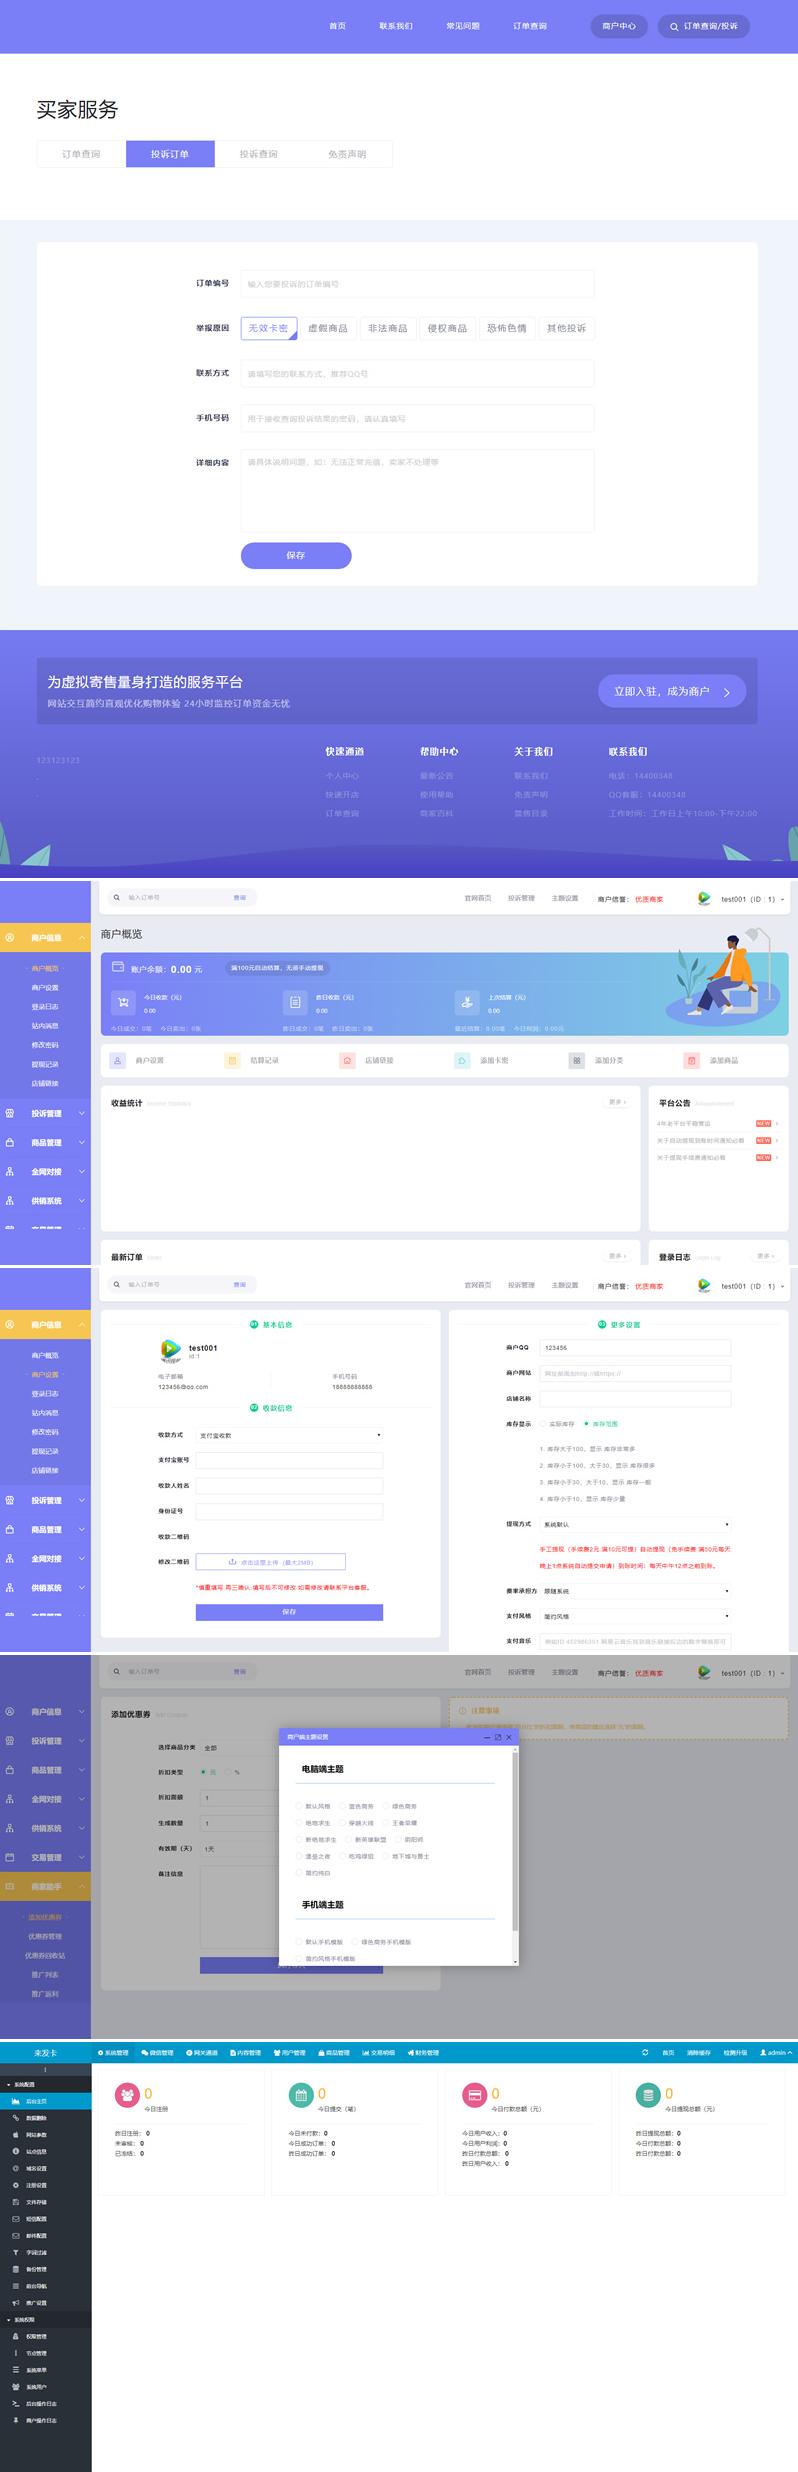 PHP多功能在线发卡自动发卡网站系统源码 带WAP版+多套商户模板-爱资源分享